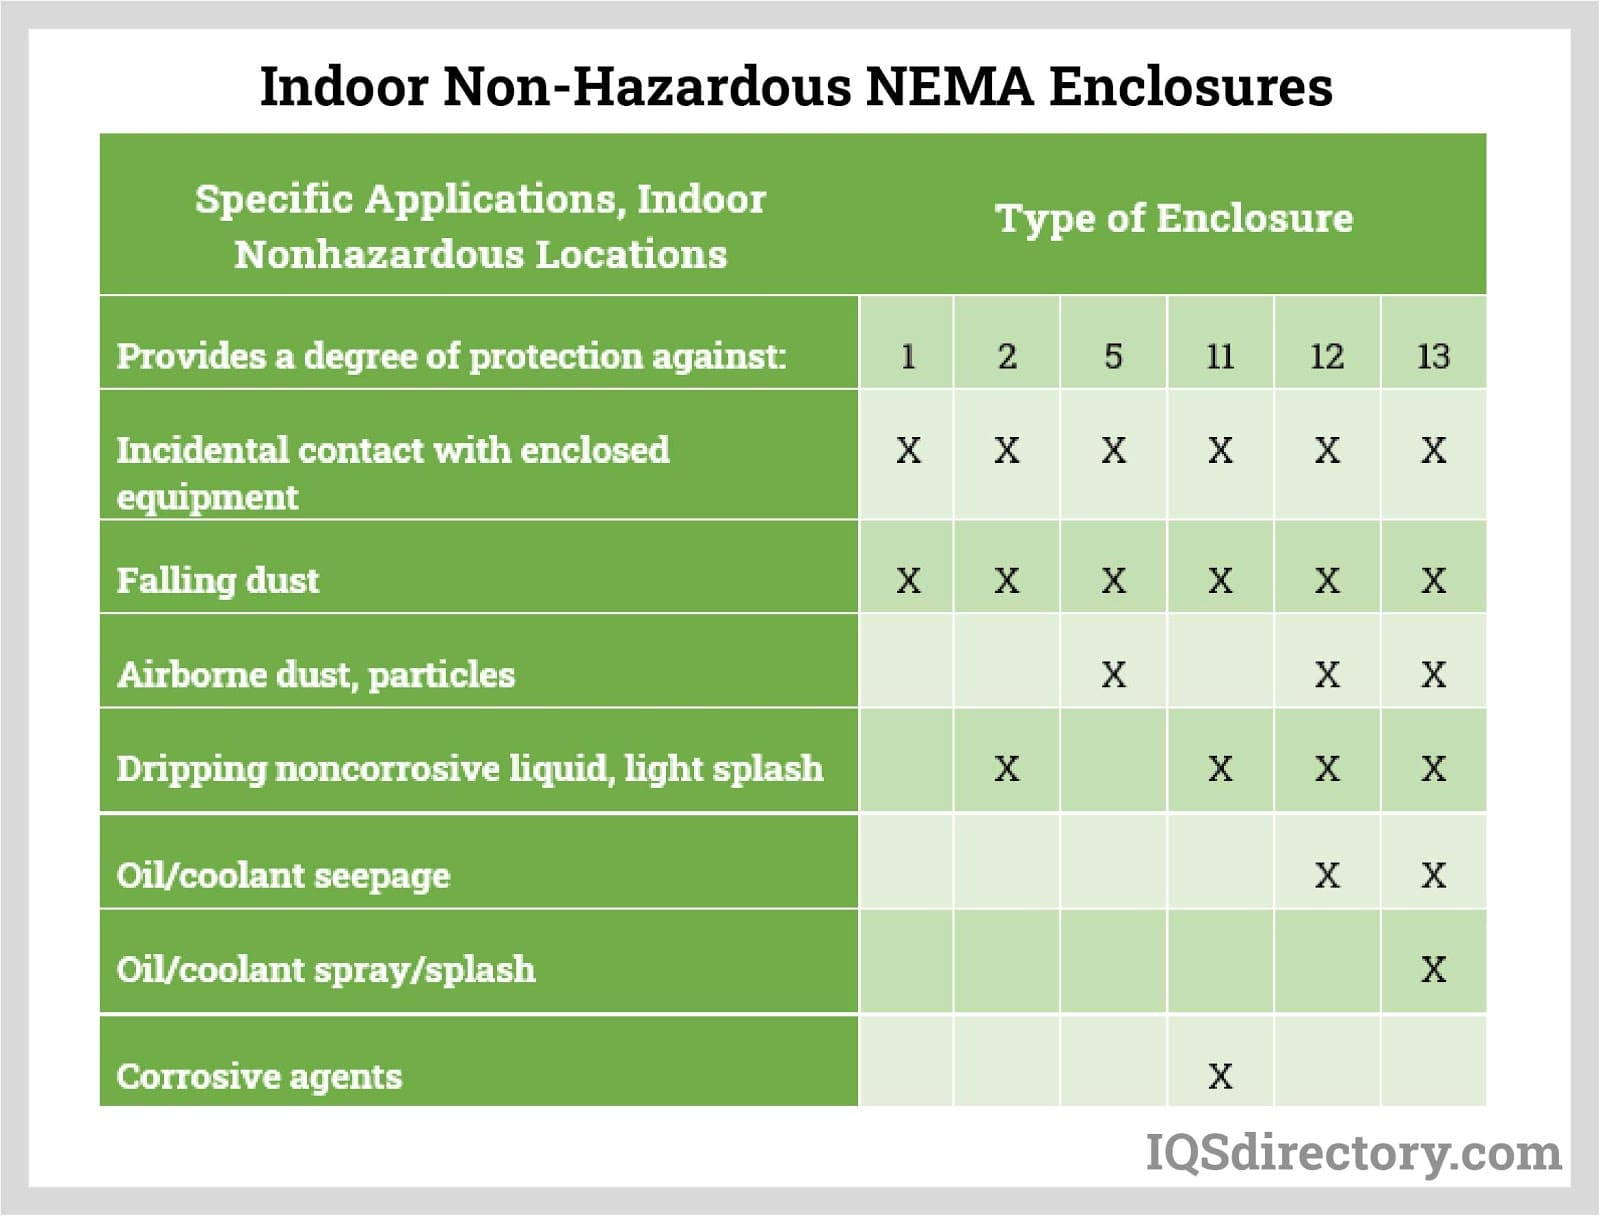 Indoor Non-Hazardous NEMA Enclosures